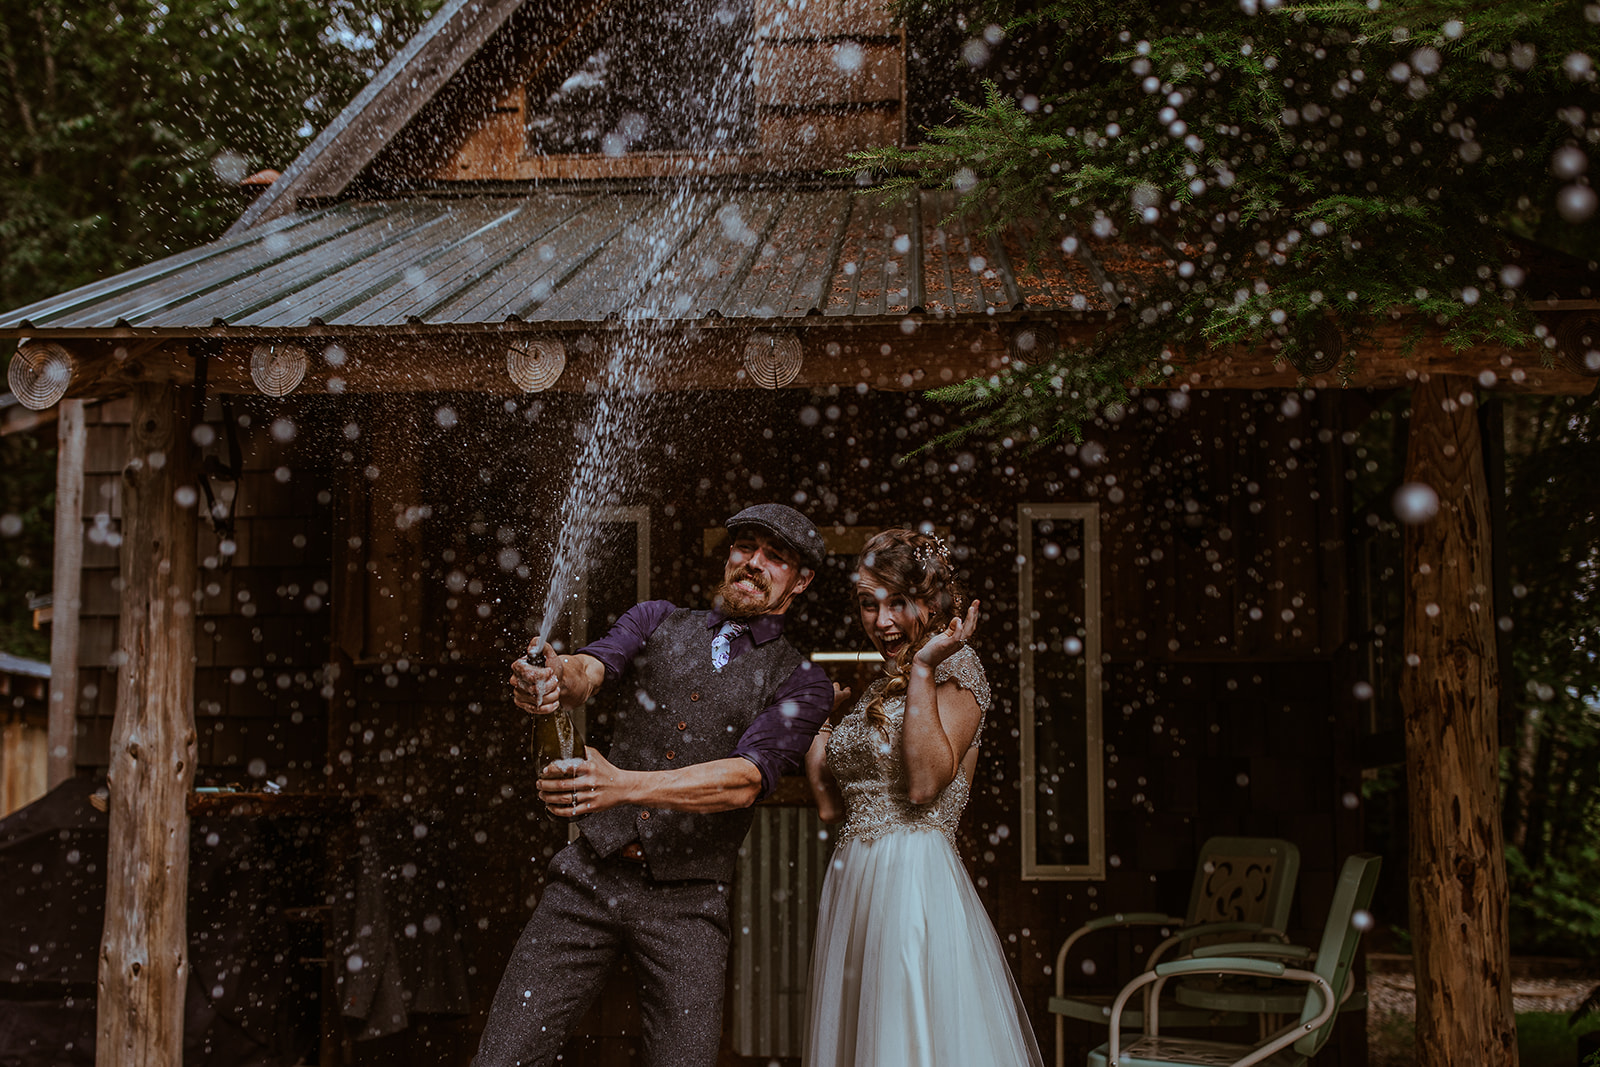 mount-rainier-cabin-elopement-megan-gallagher-photography_(325_of_568).jpg